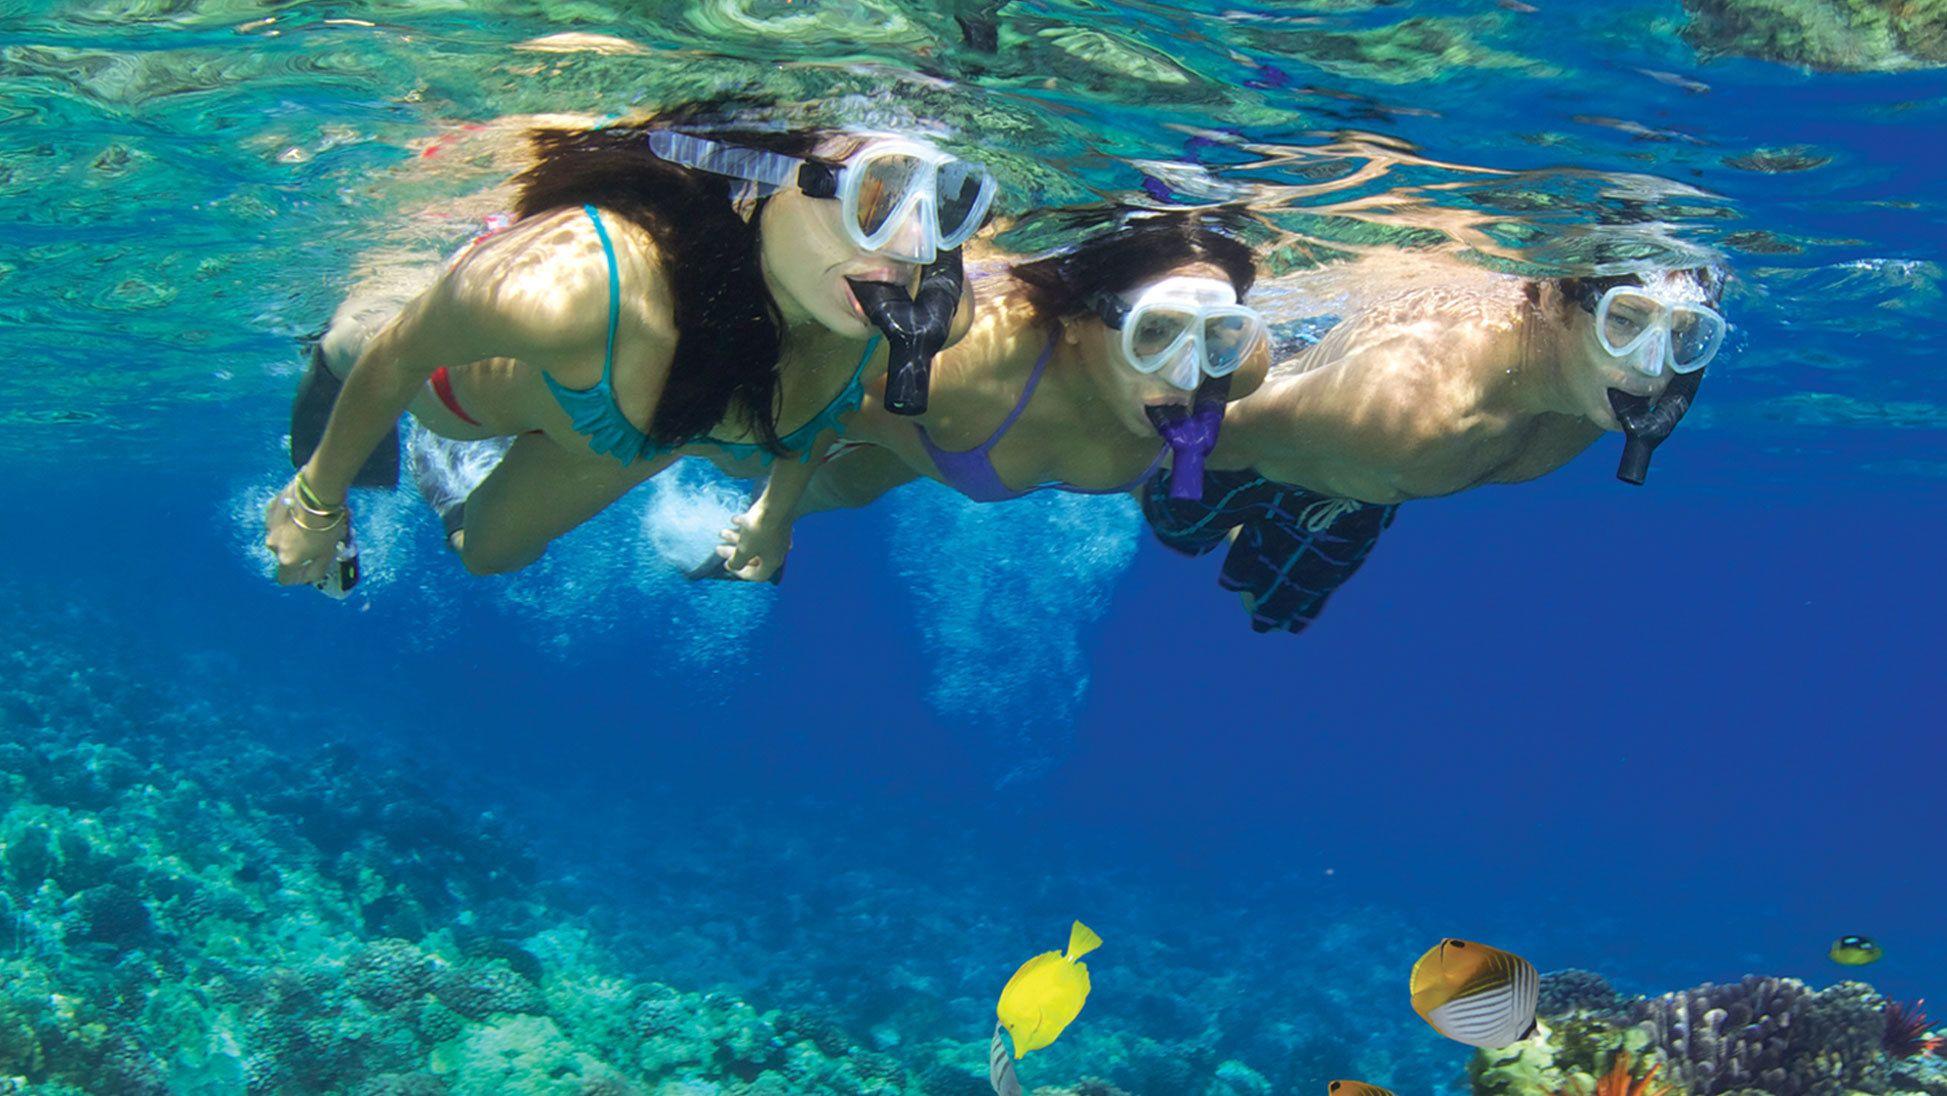 Group snorkeling in the ocean near Maui